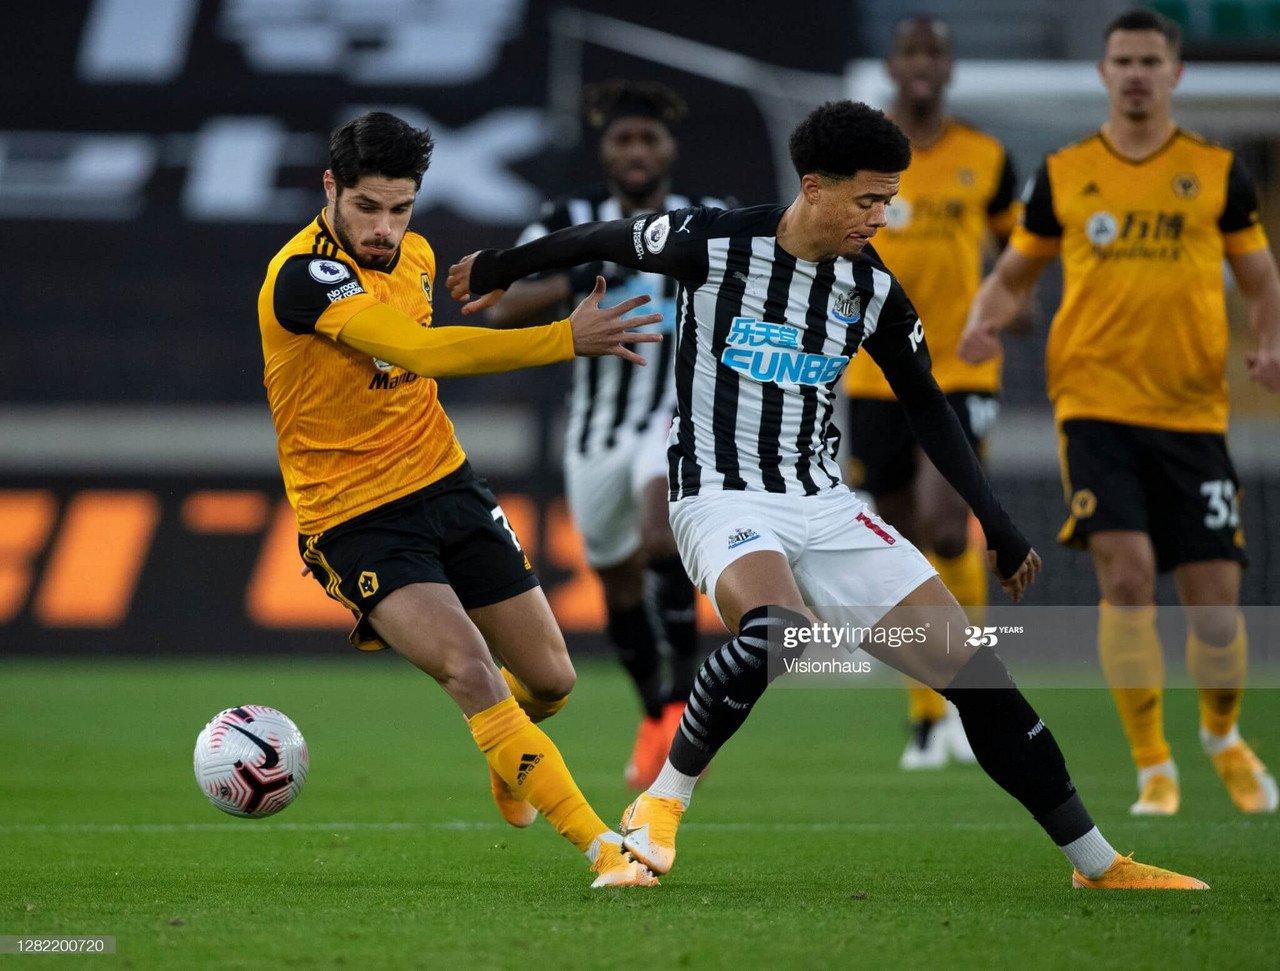 Wolverhampton Wanderers 1-1 Newcastle United: Player ratings